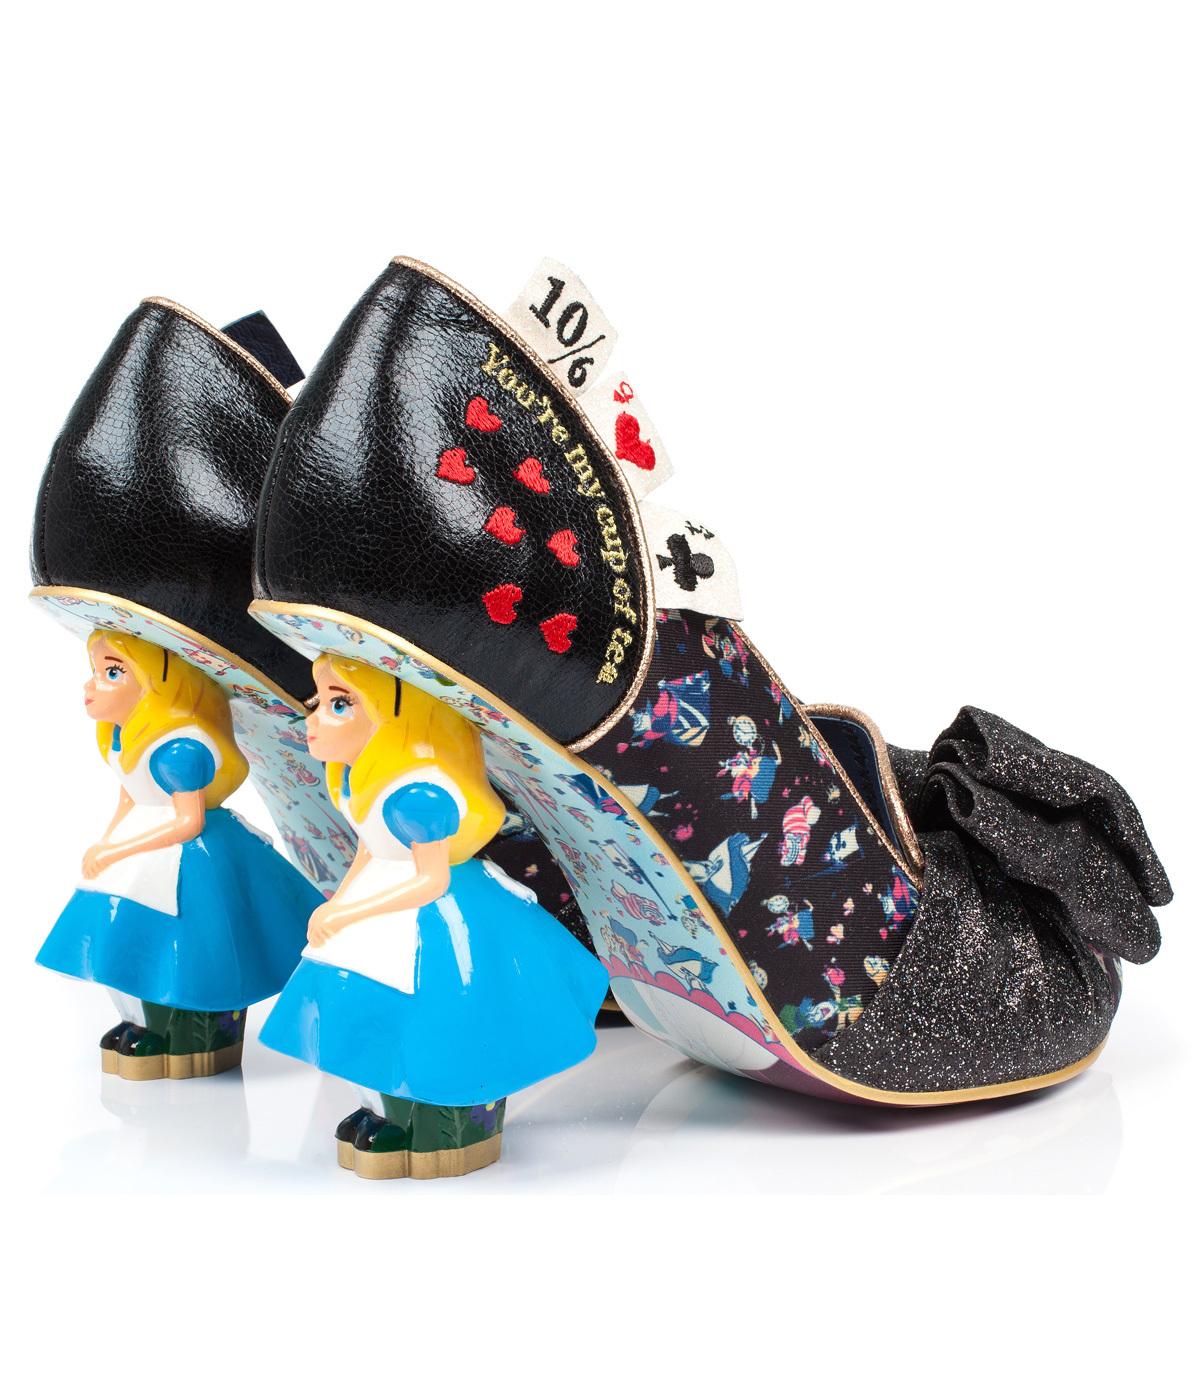 db30931927a Wonderland This Way IRREGULAR CHOICE Retro Heels